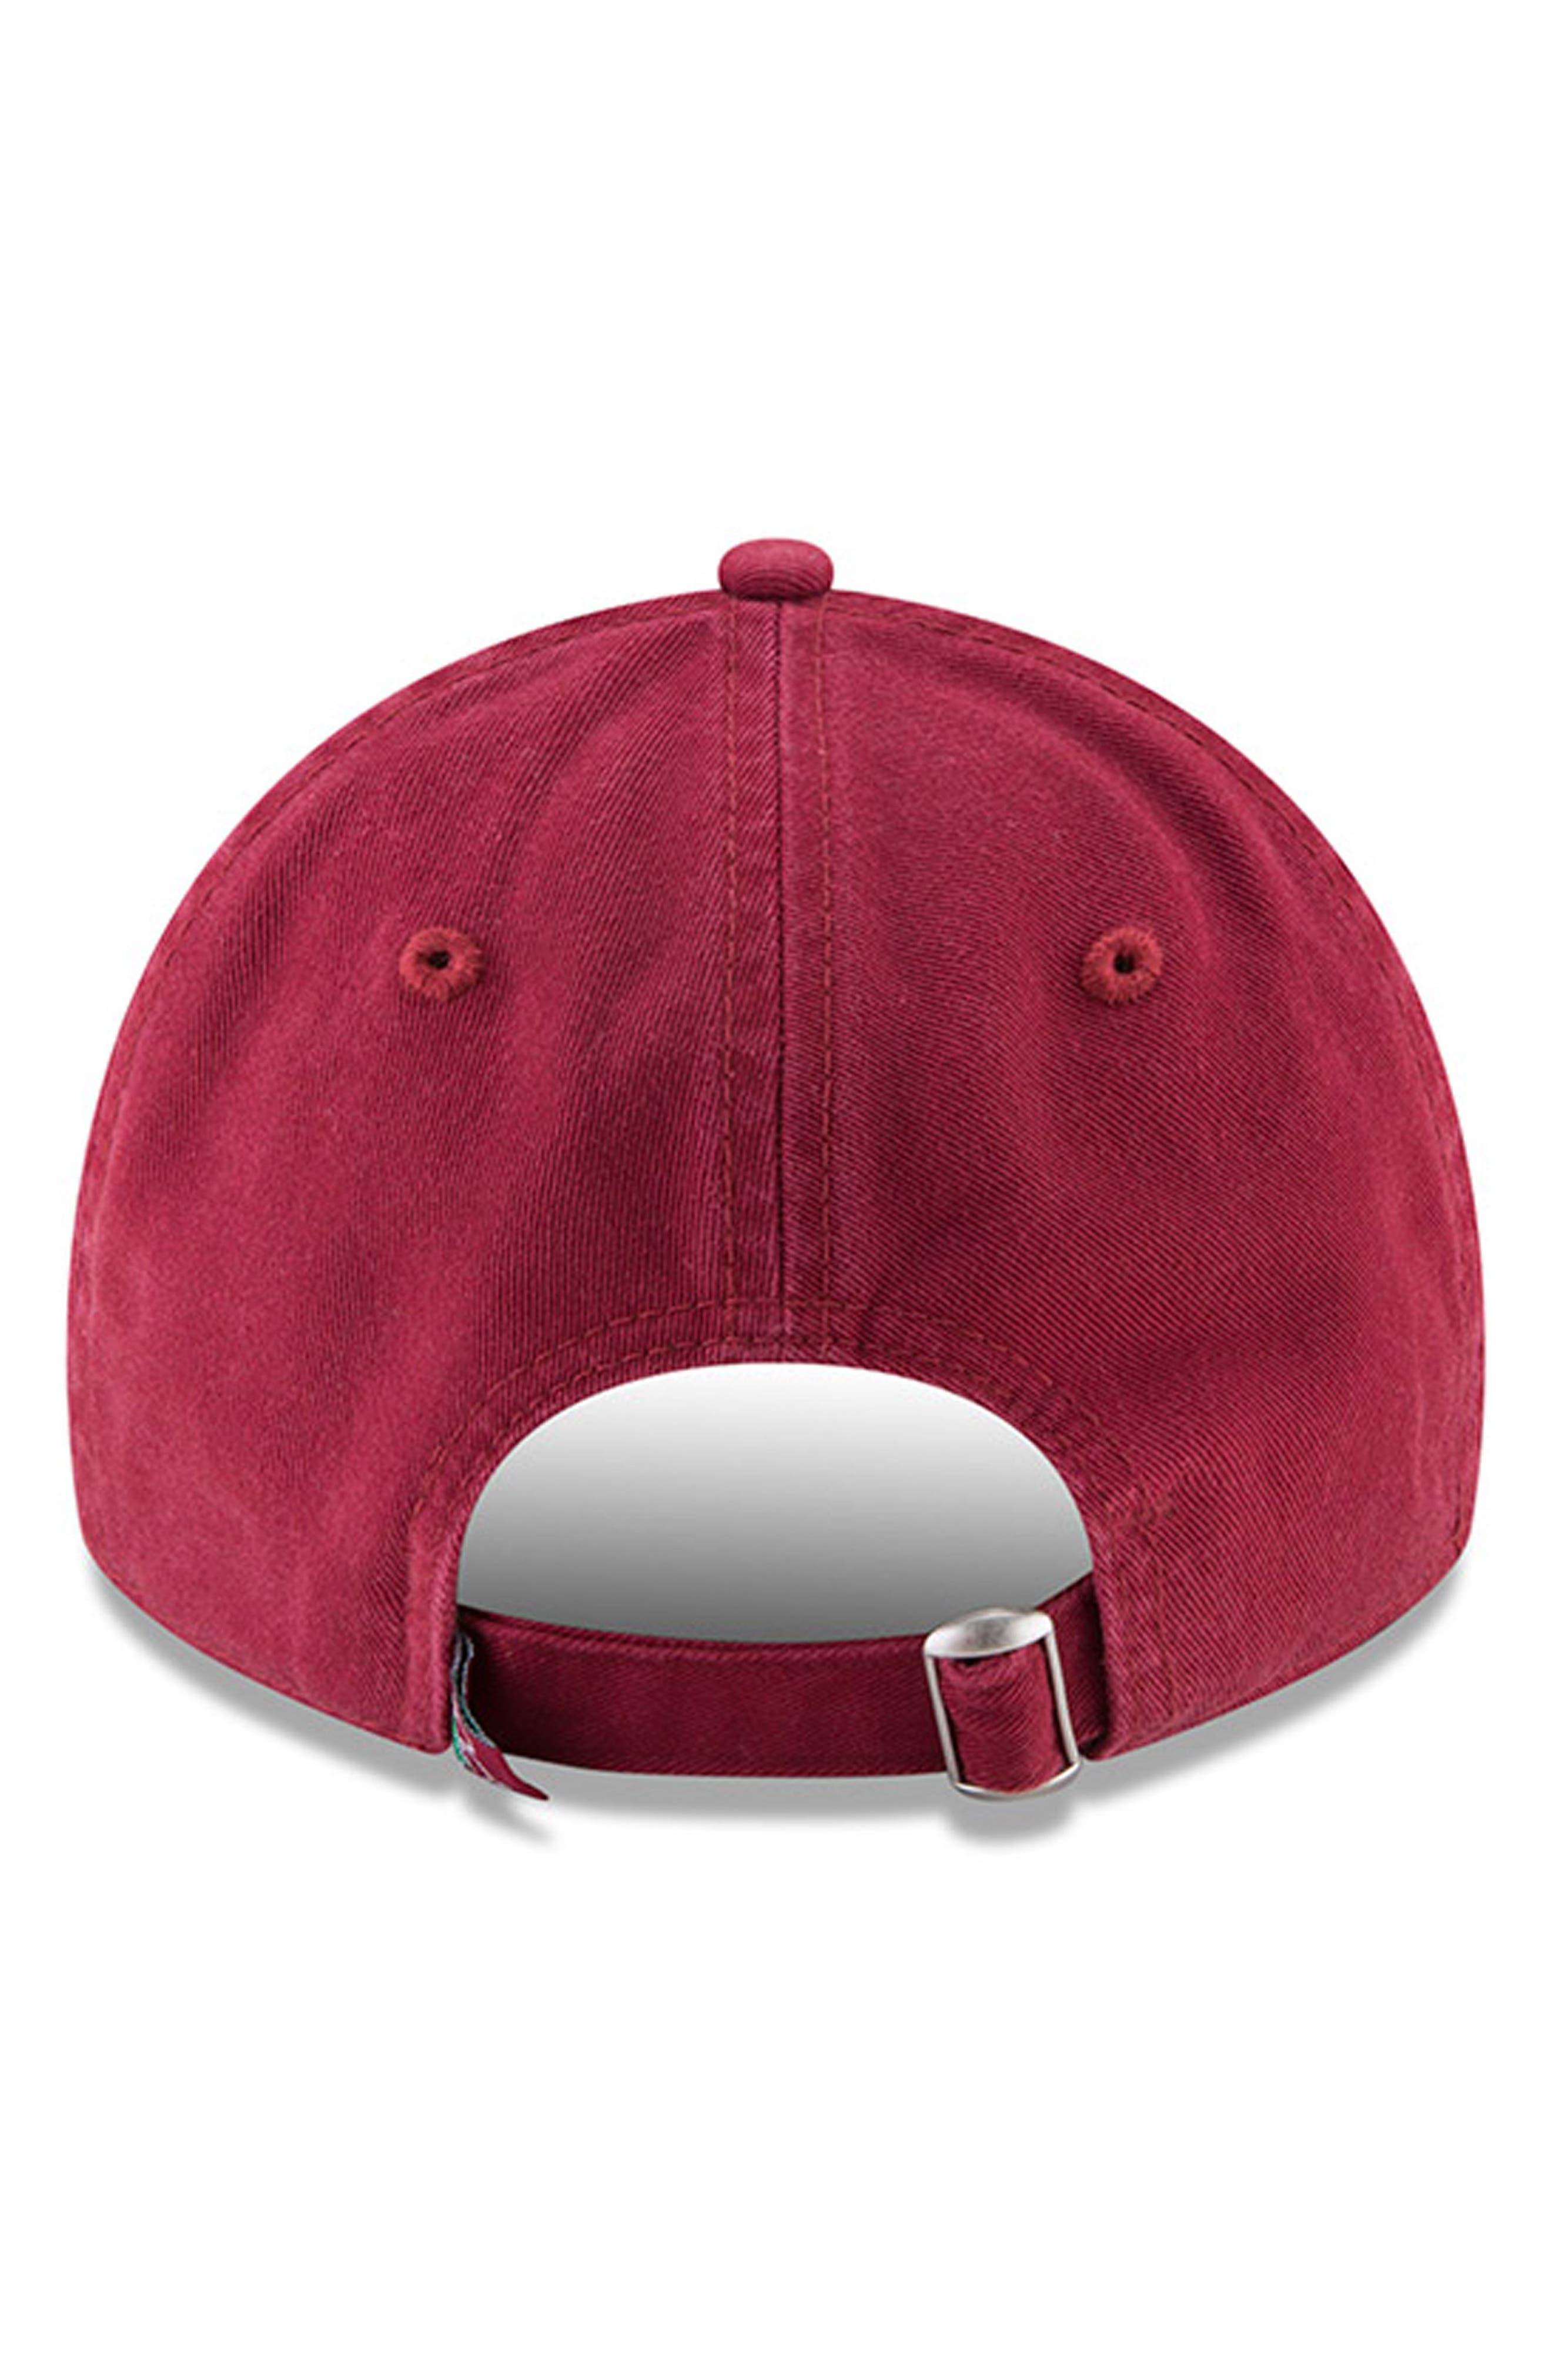 New Era Collegiate Core Classic - Stanford Cardinal Baseball Cap,                             Alternate thumbnail 2, color,                             Stanford Cardinal